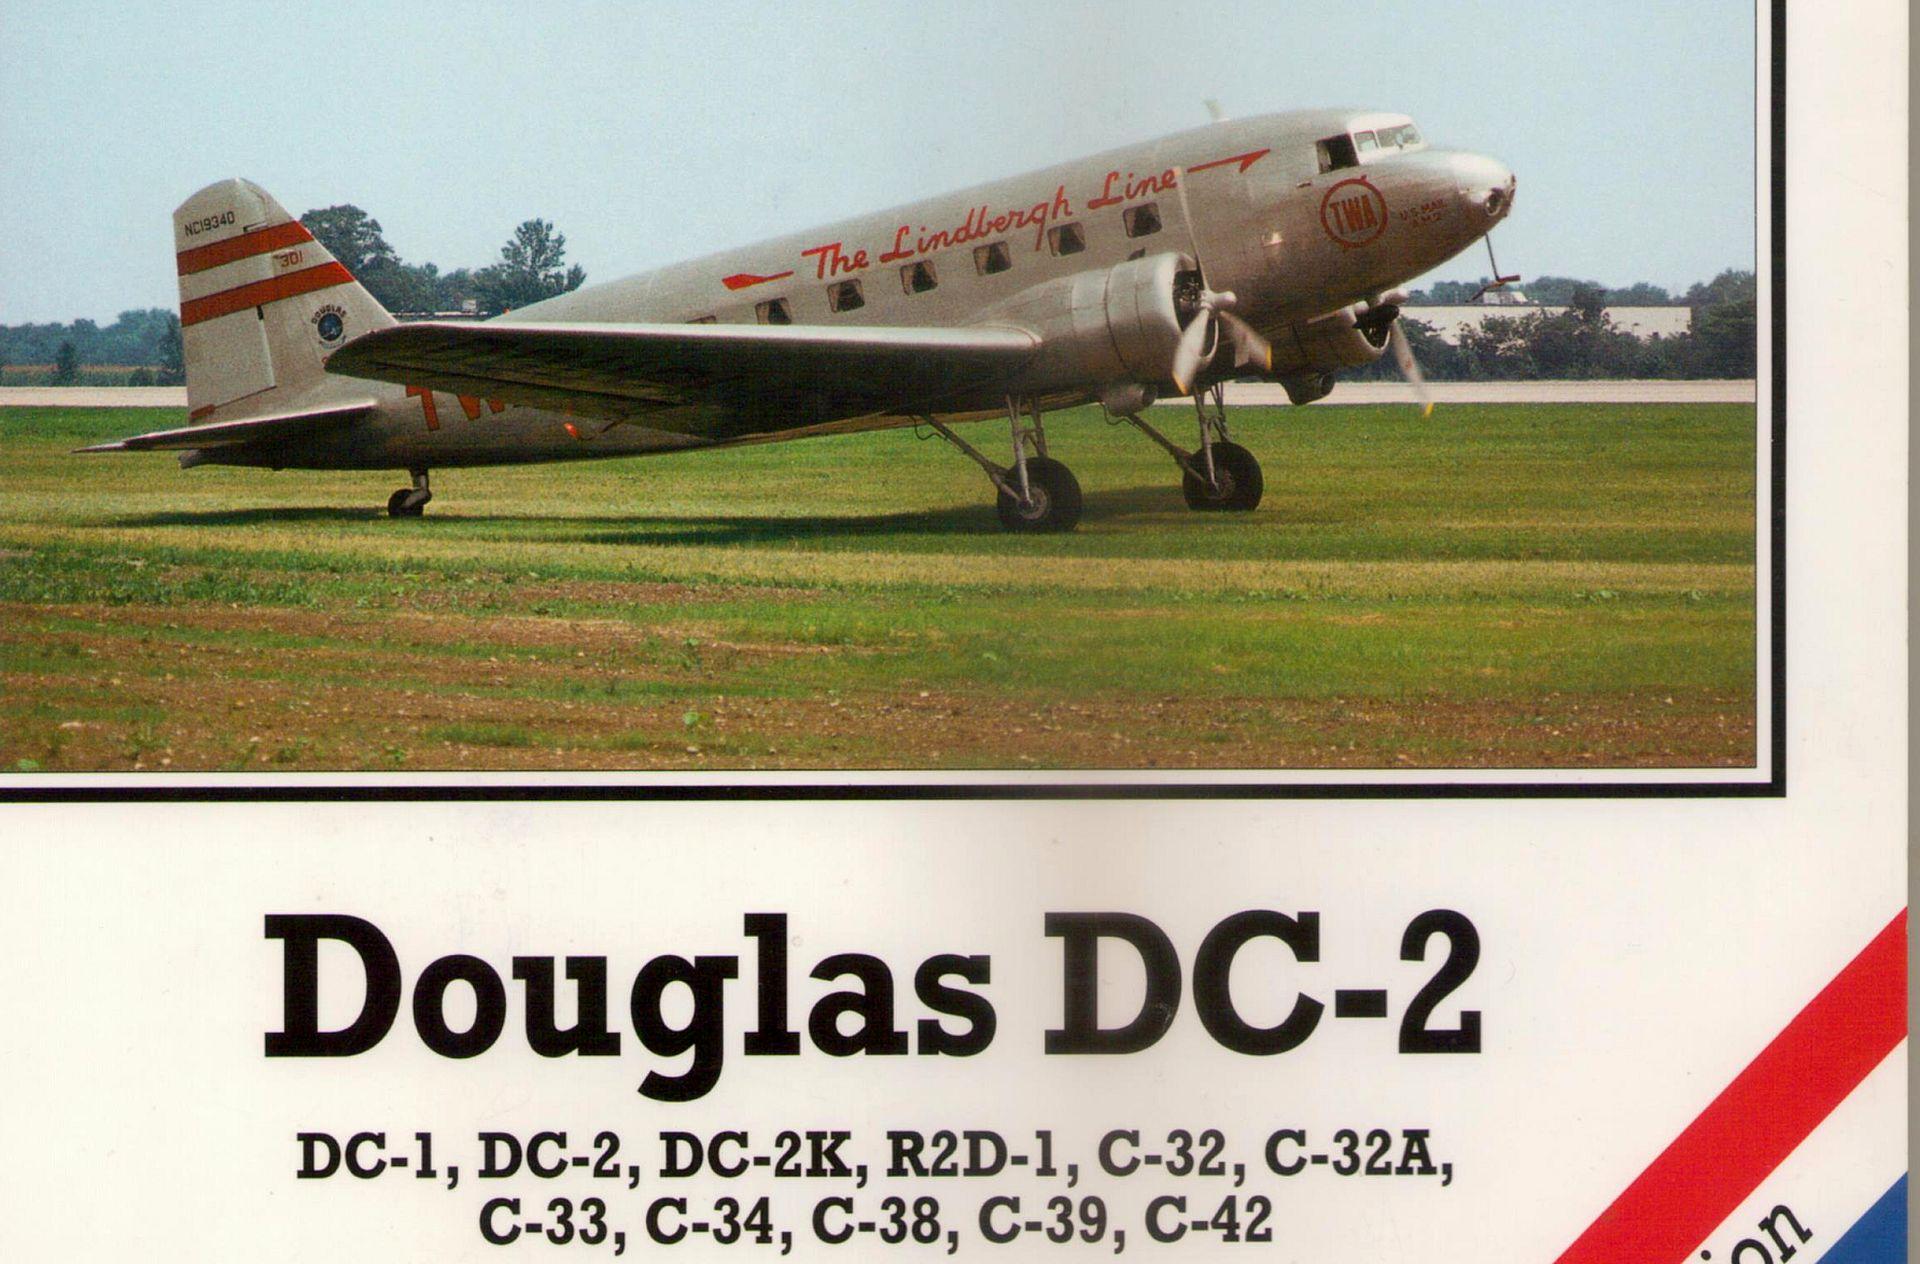 DOUGLAS DC-2, 4+ PUBLICATIONS, NÁHLED NA PUBLIKACI